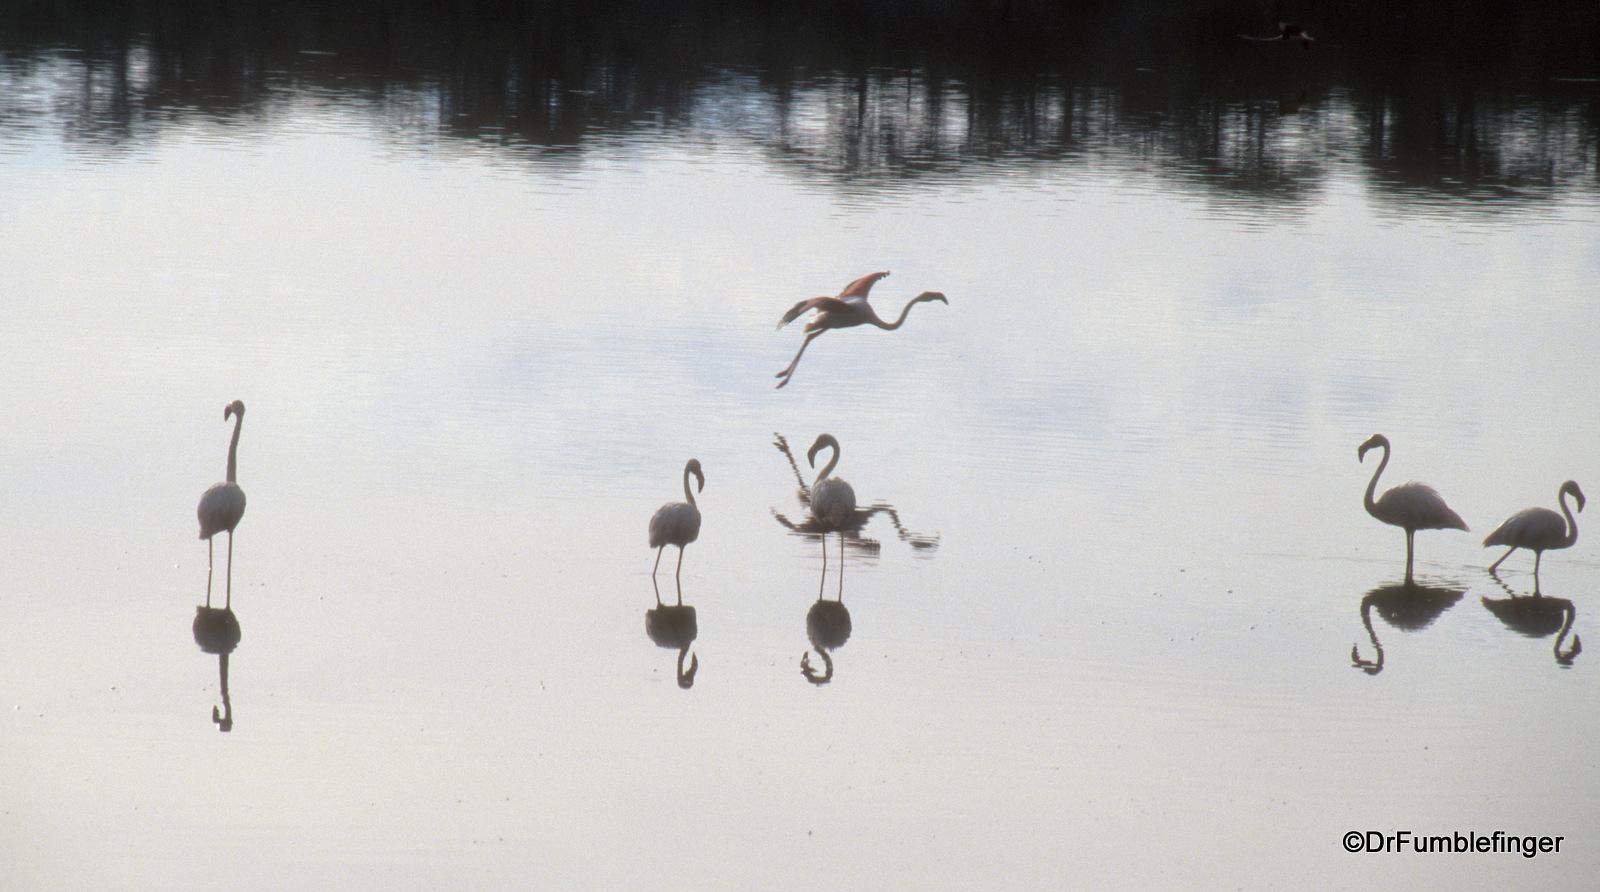 Serengeti National Park, Flamingos